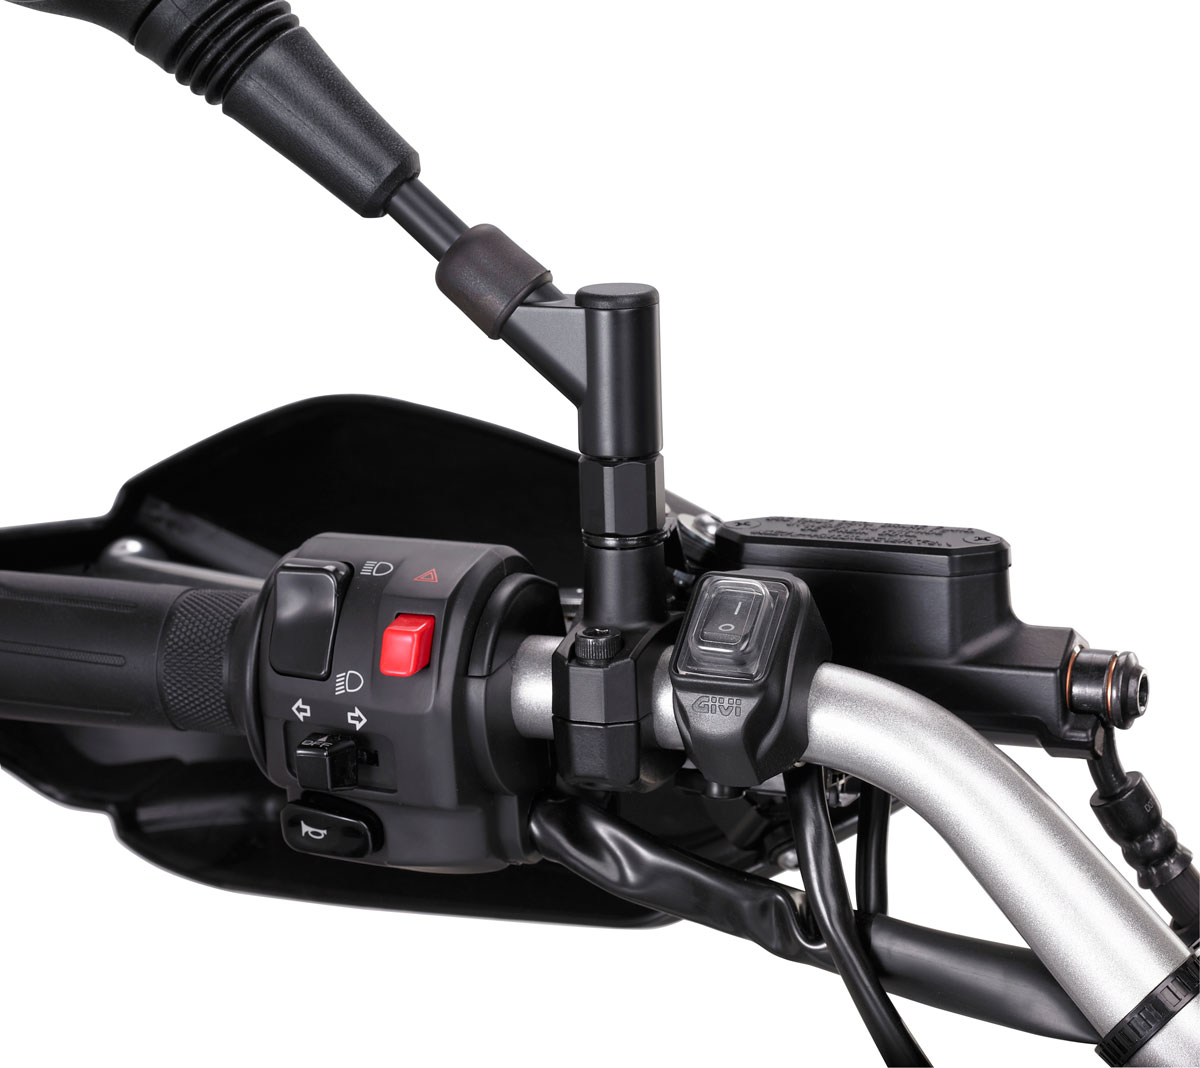 Faretti Alogeni Supplementari Givi S310 Trekker Lights